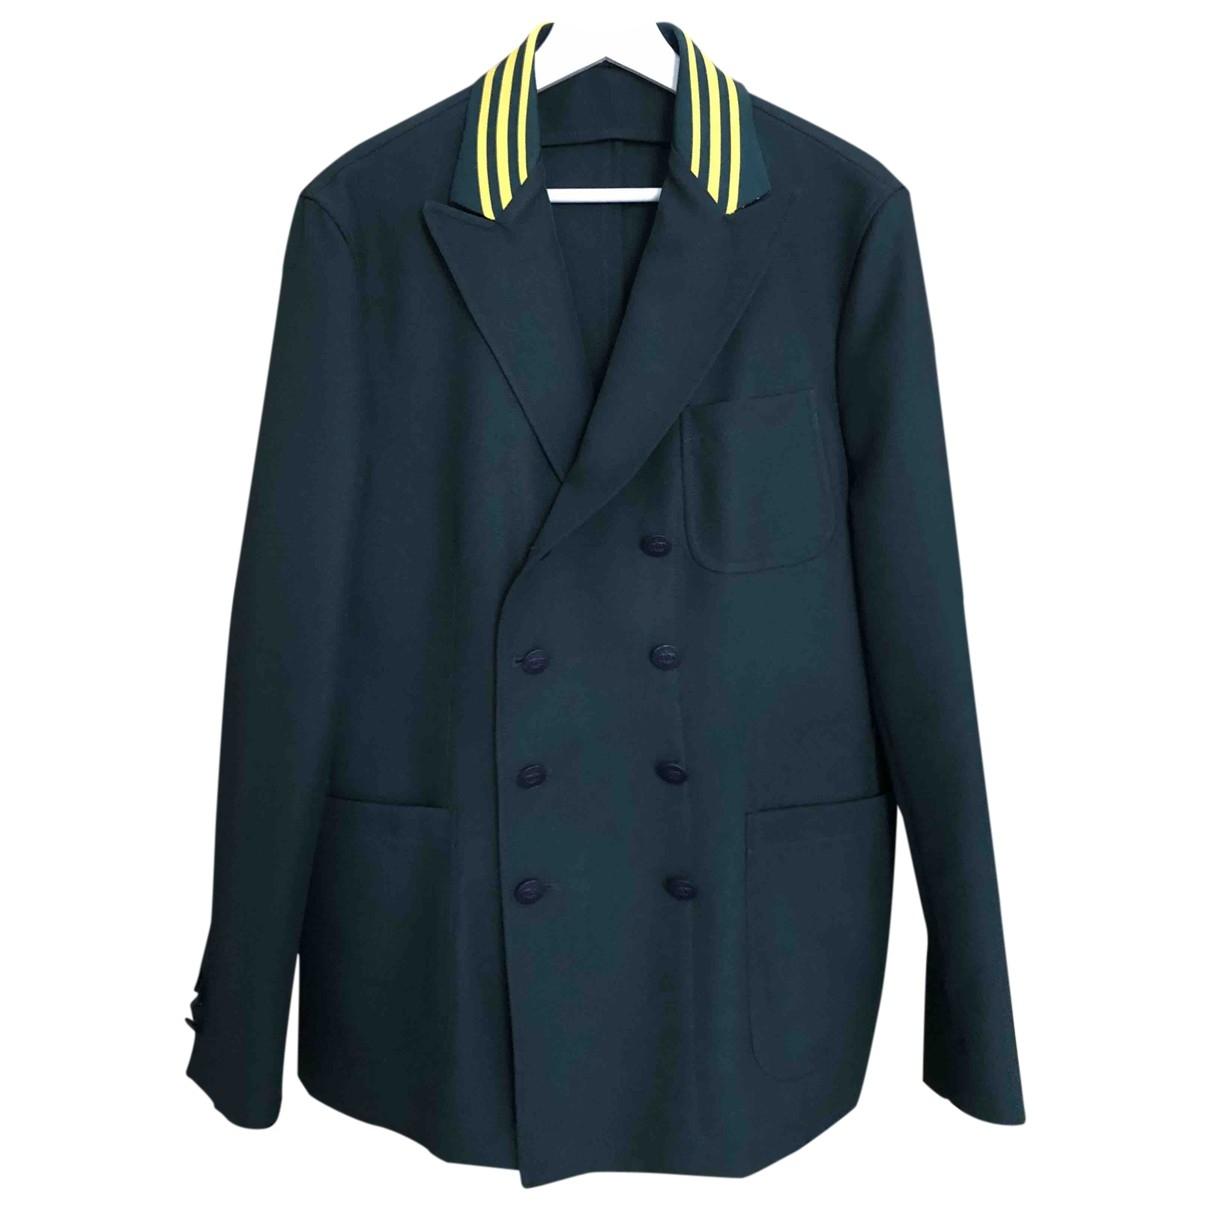 The Gigi \N Green jacket  for Men 52 IT